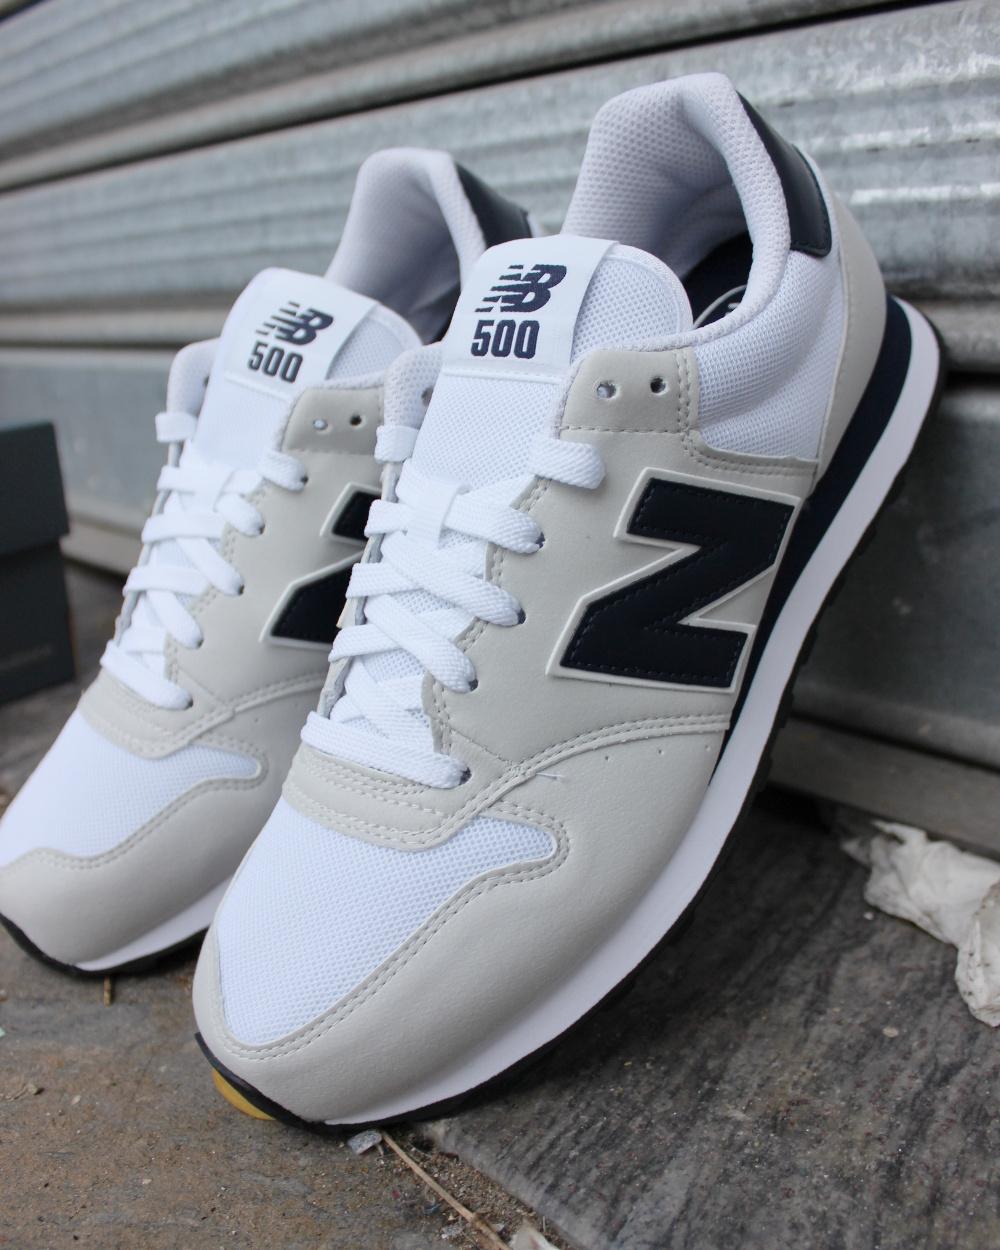 New Balance 500 uomo scarpe casual ginnastica sneakers